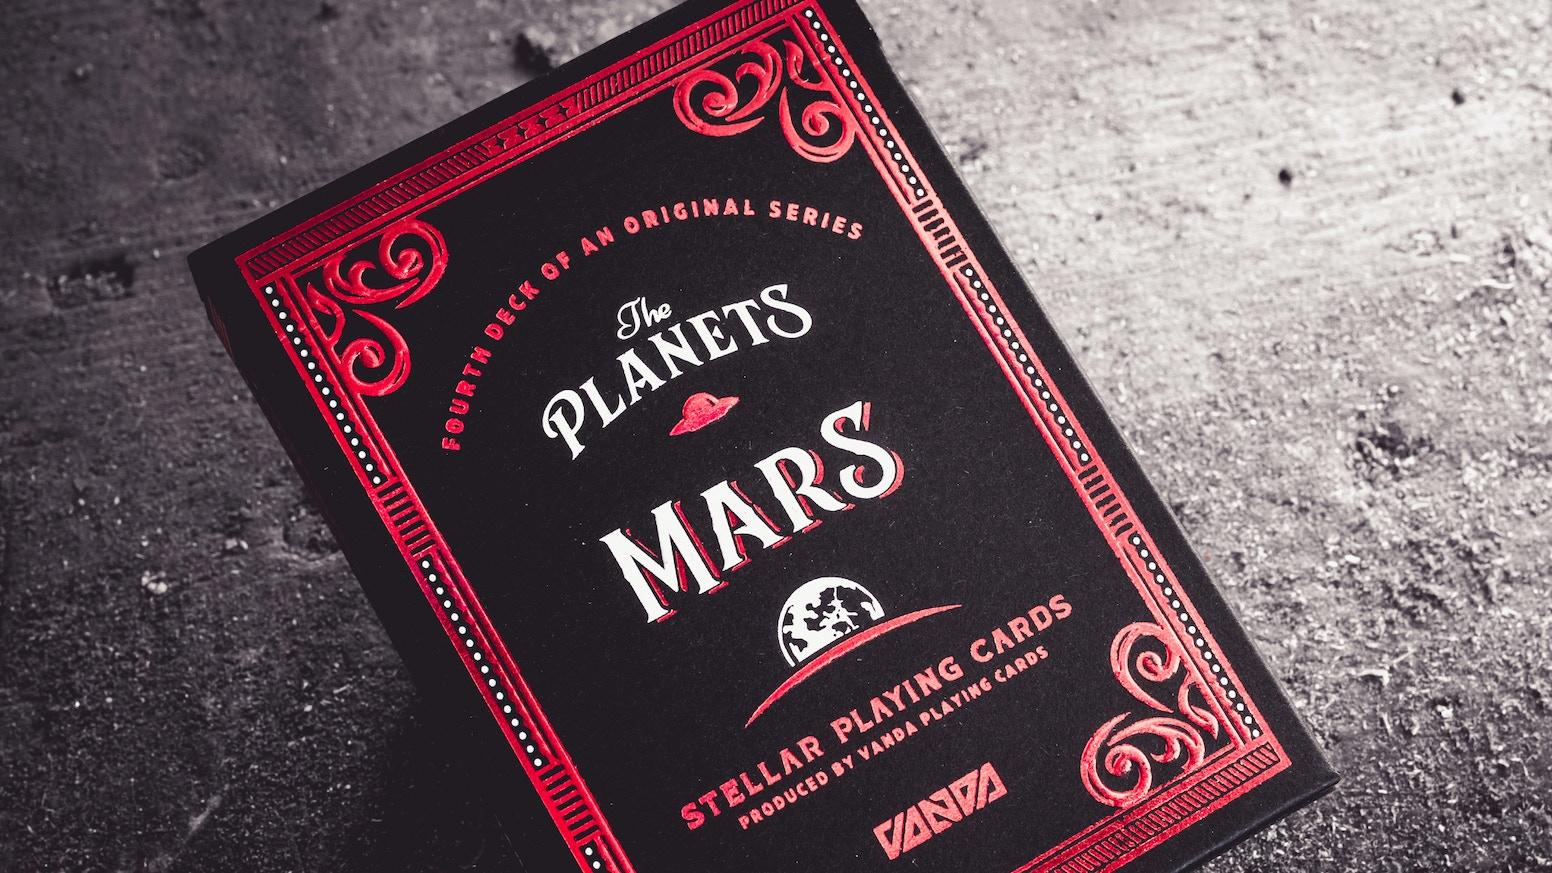 A deck of Stellar Playing Cards — Vanda Artists Series designed by Srdjan Vidakovic.